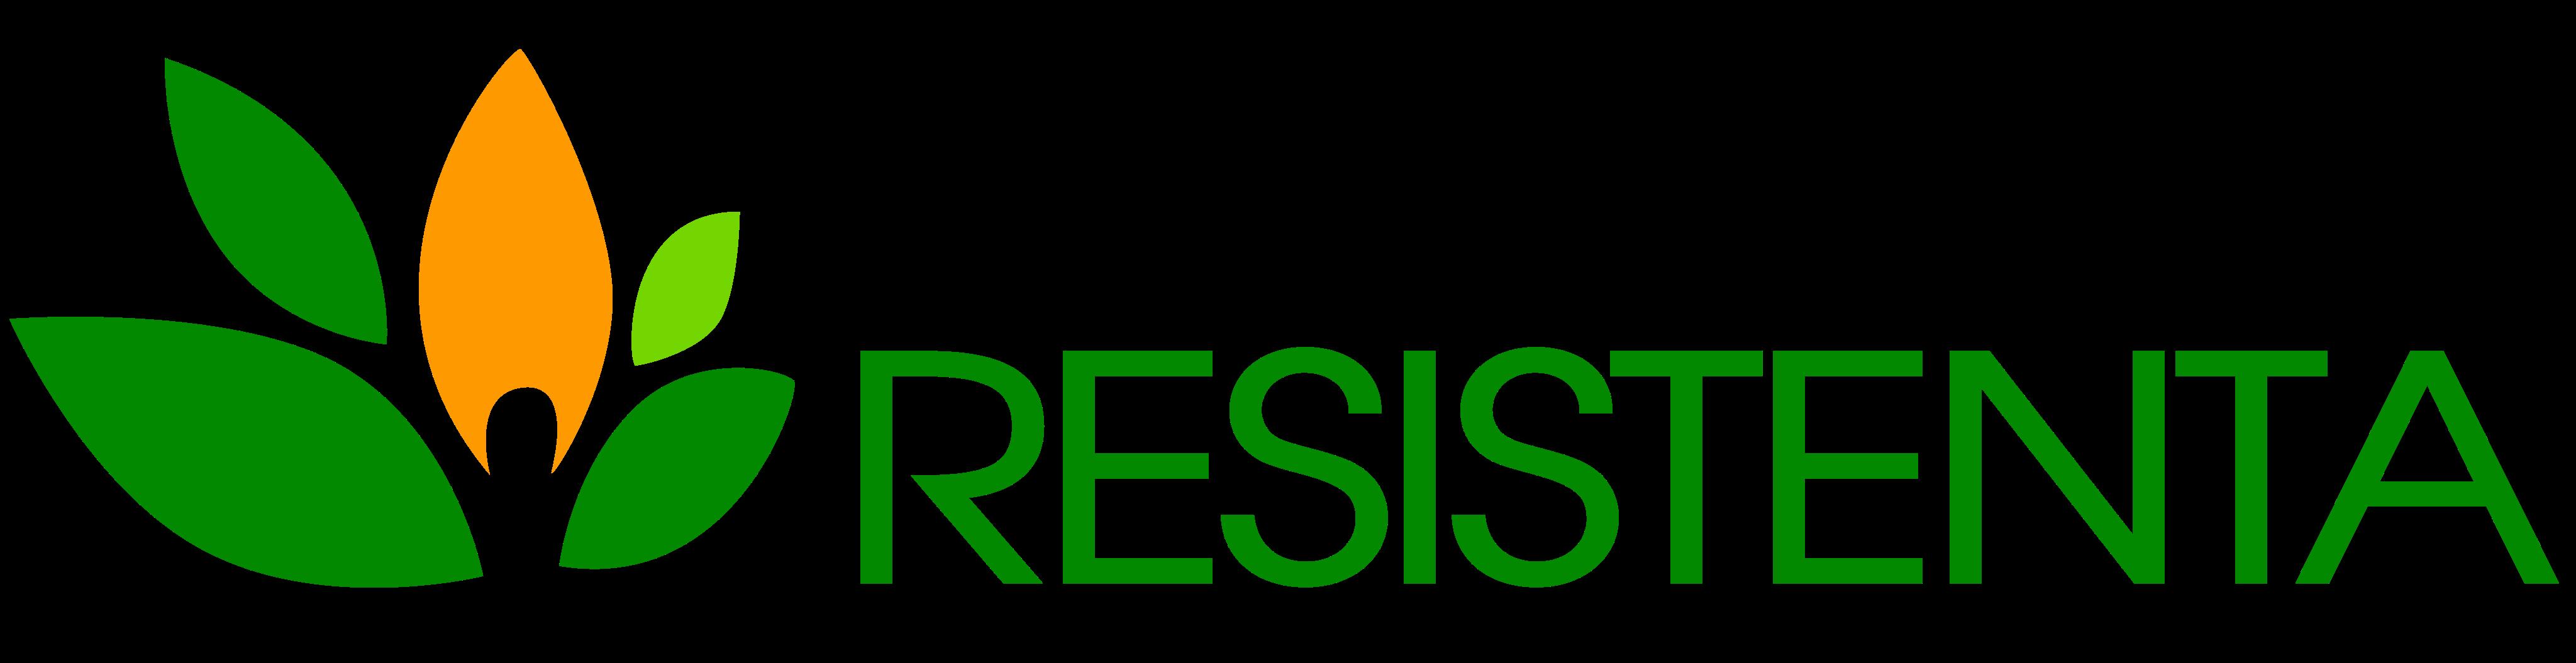 Resistenta.pl